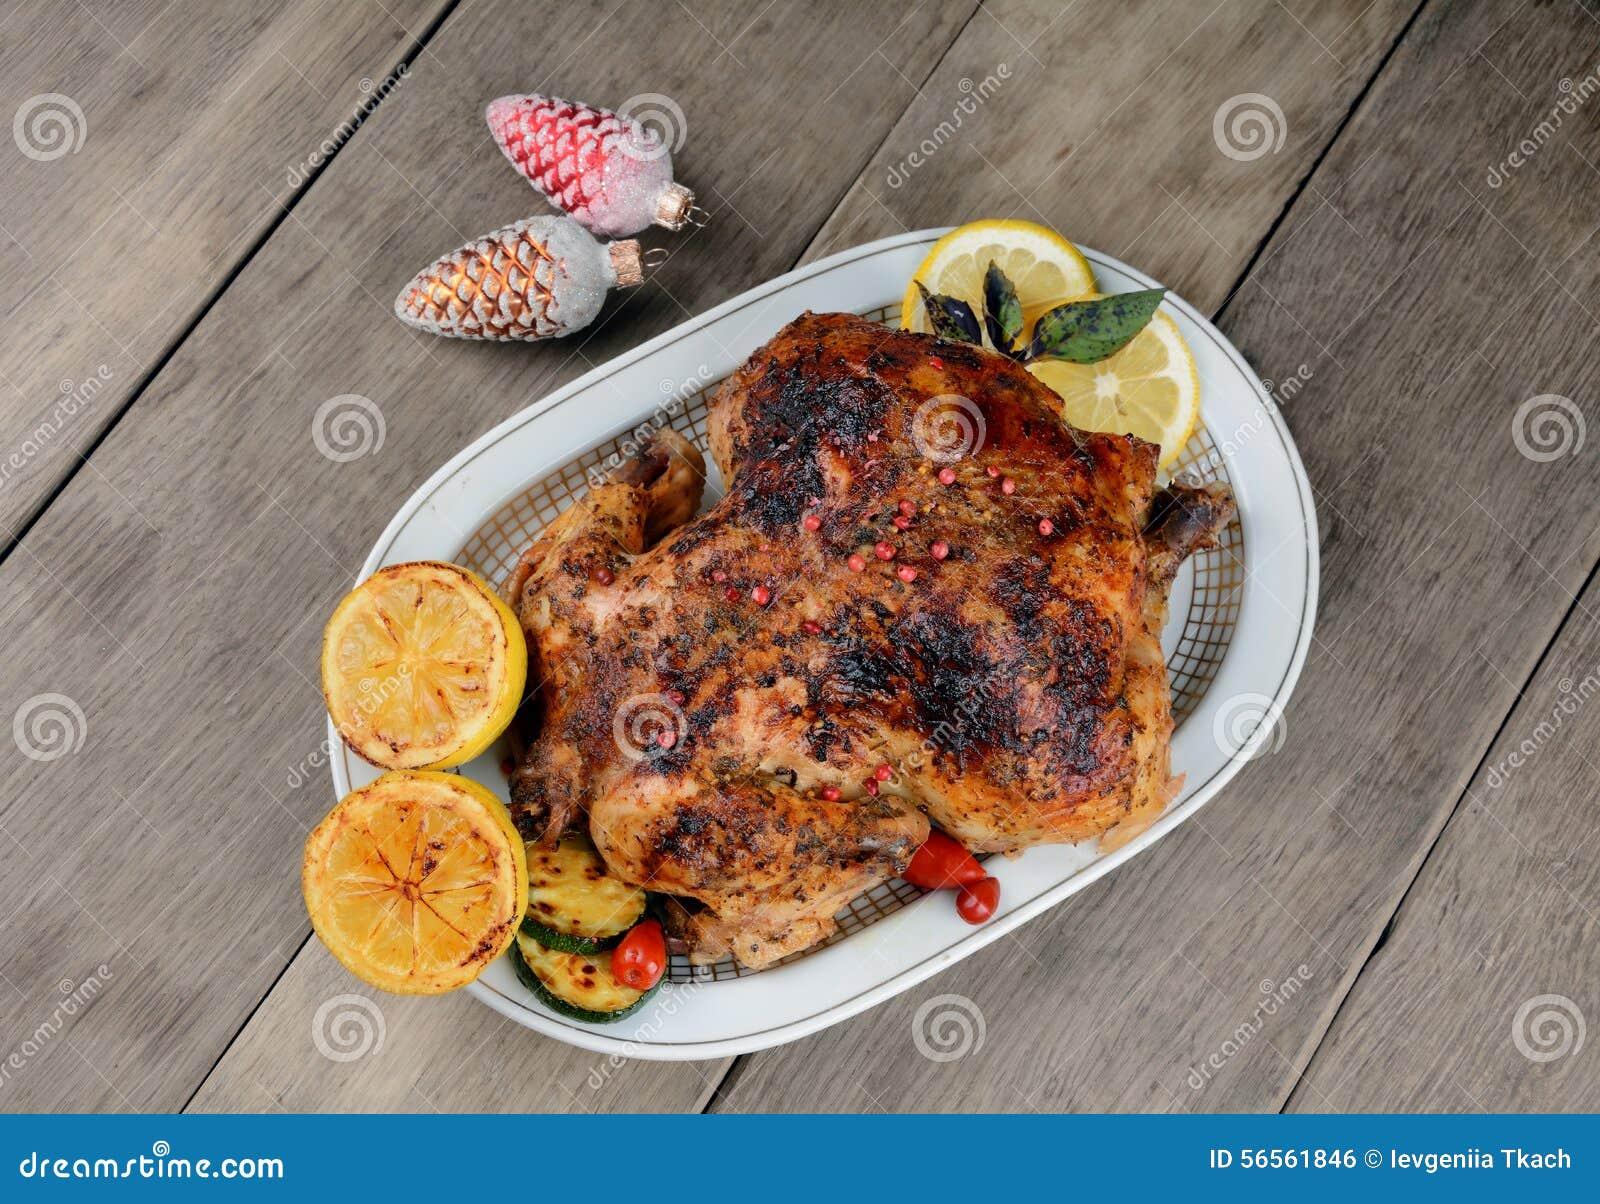 Download Ψημένο νόστιμο καυτό κοτόπουλο Στοκ Εικόνες - εικόνα από προετοιμασμένος, τριζάτος: 56561846